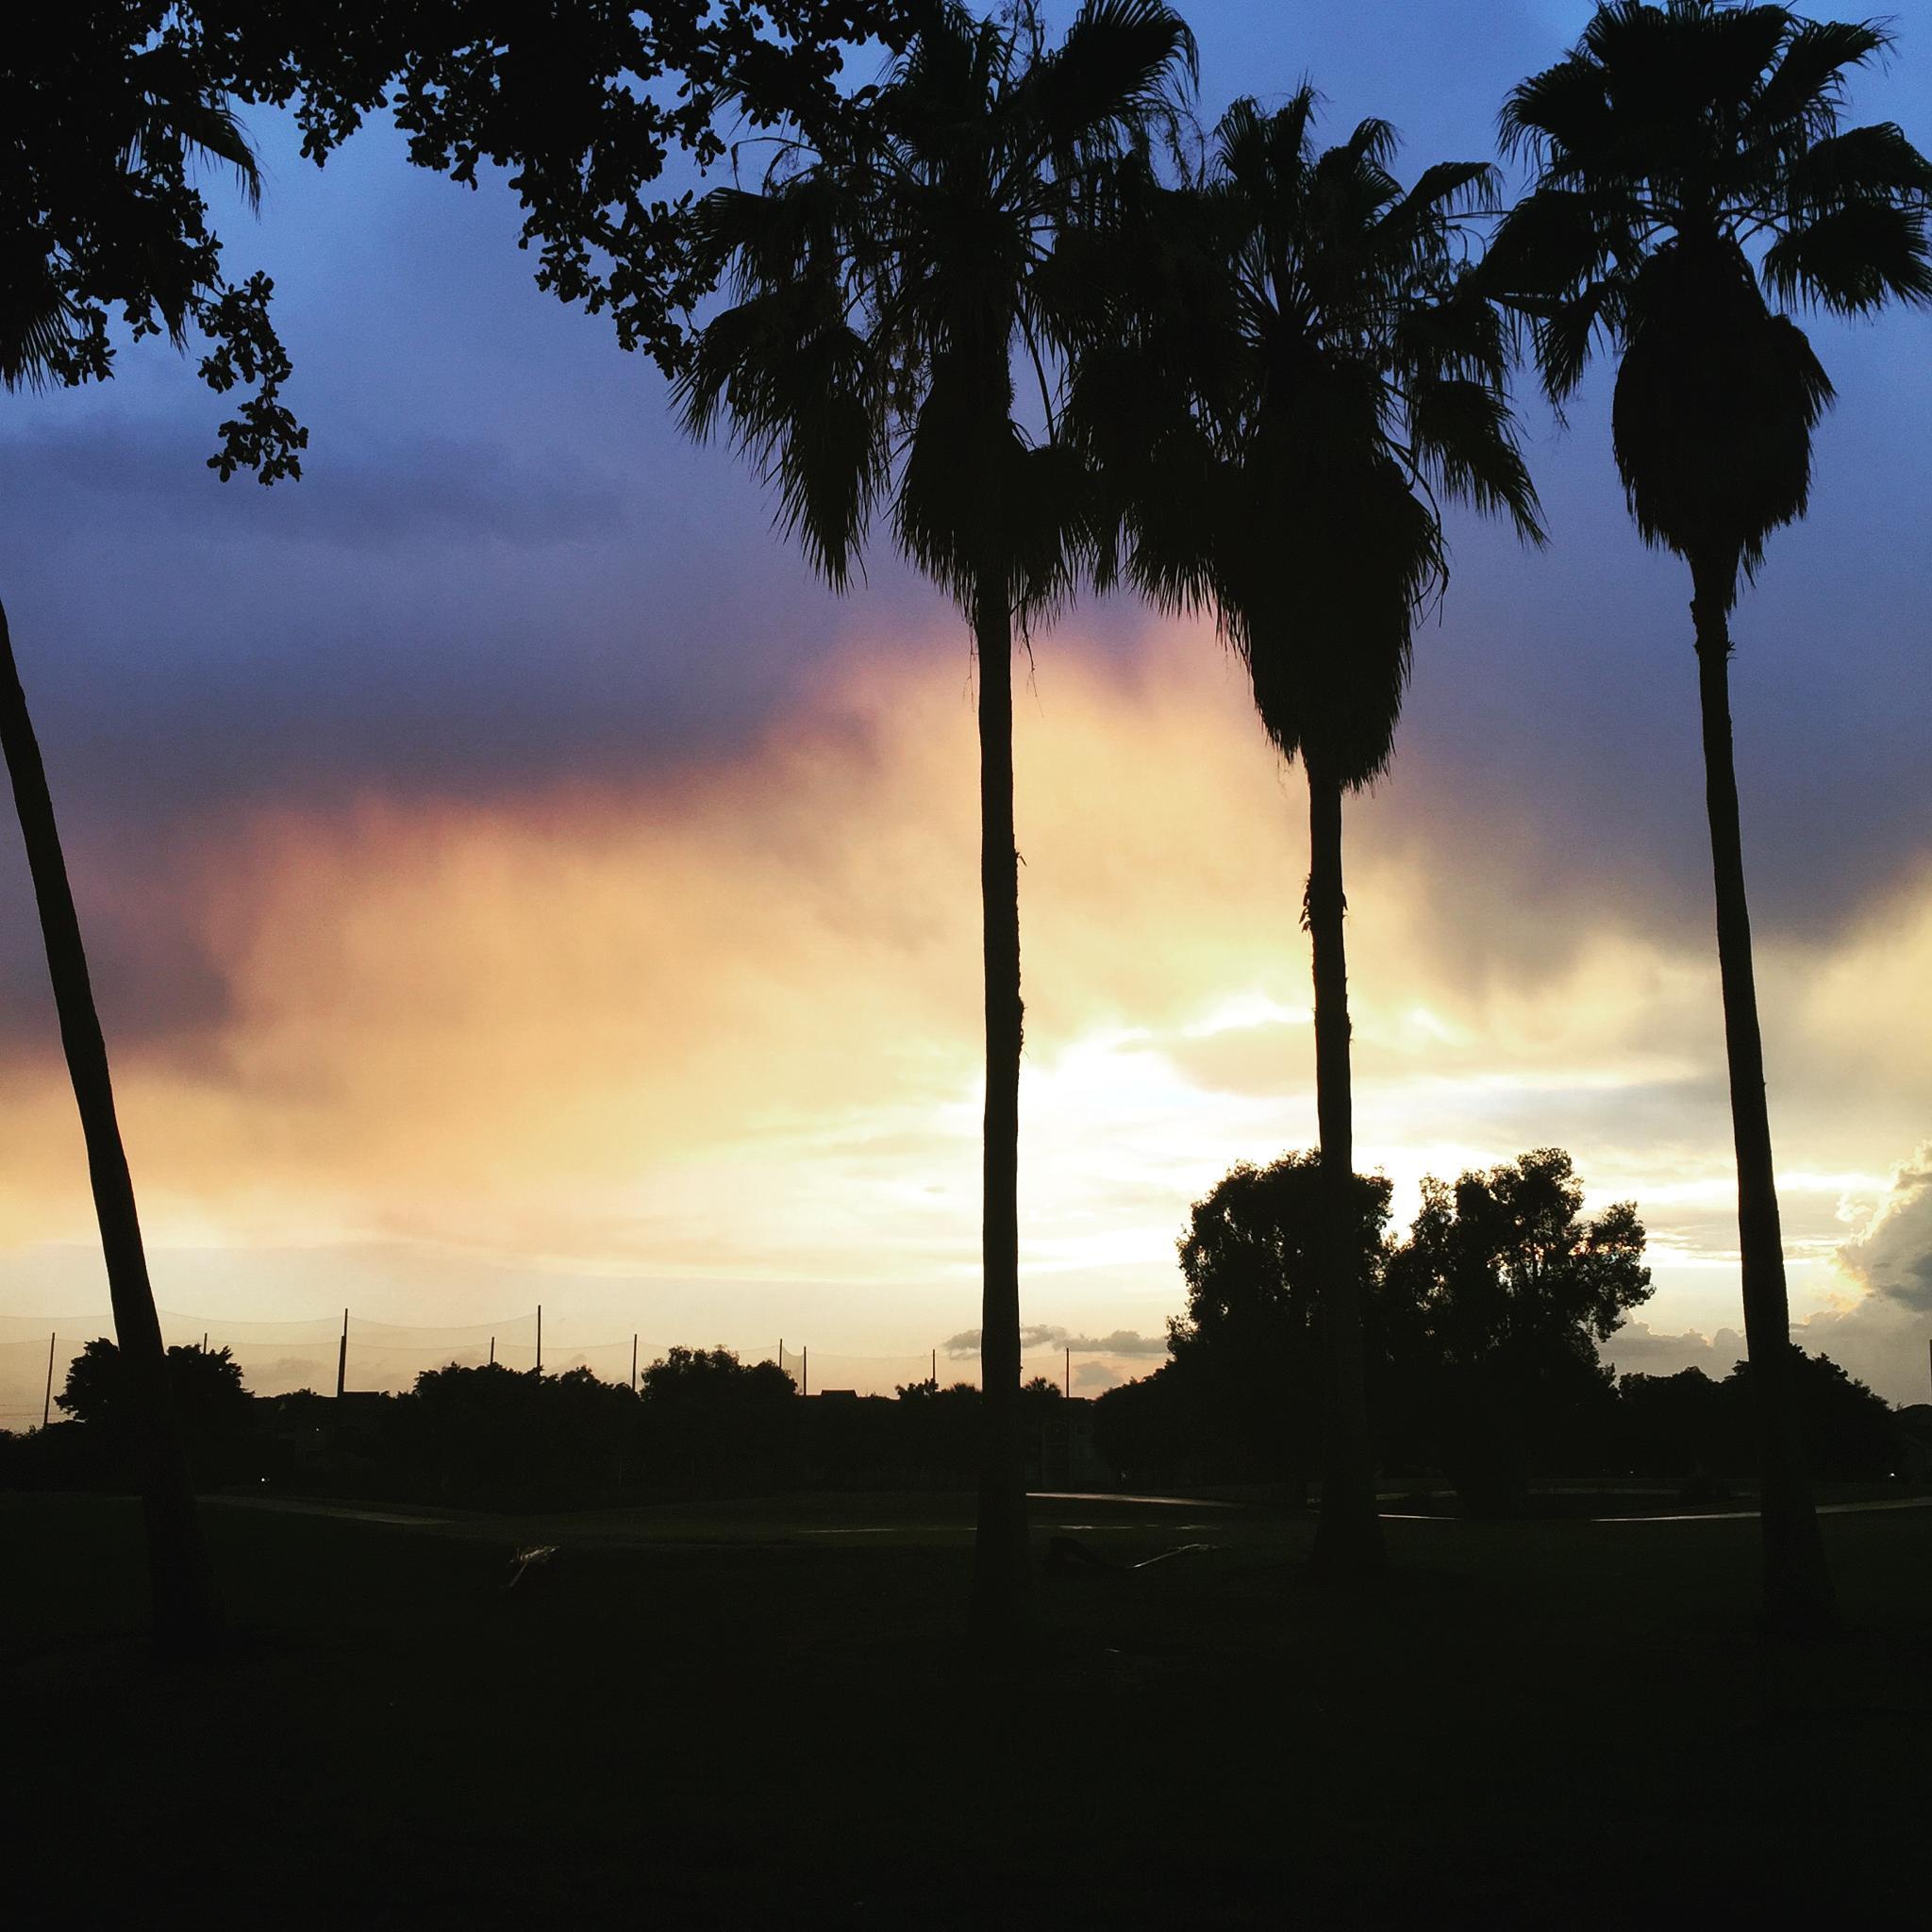 Sunset by bmacebi416